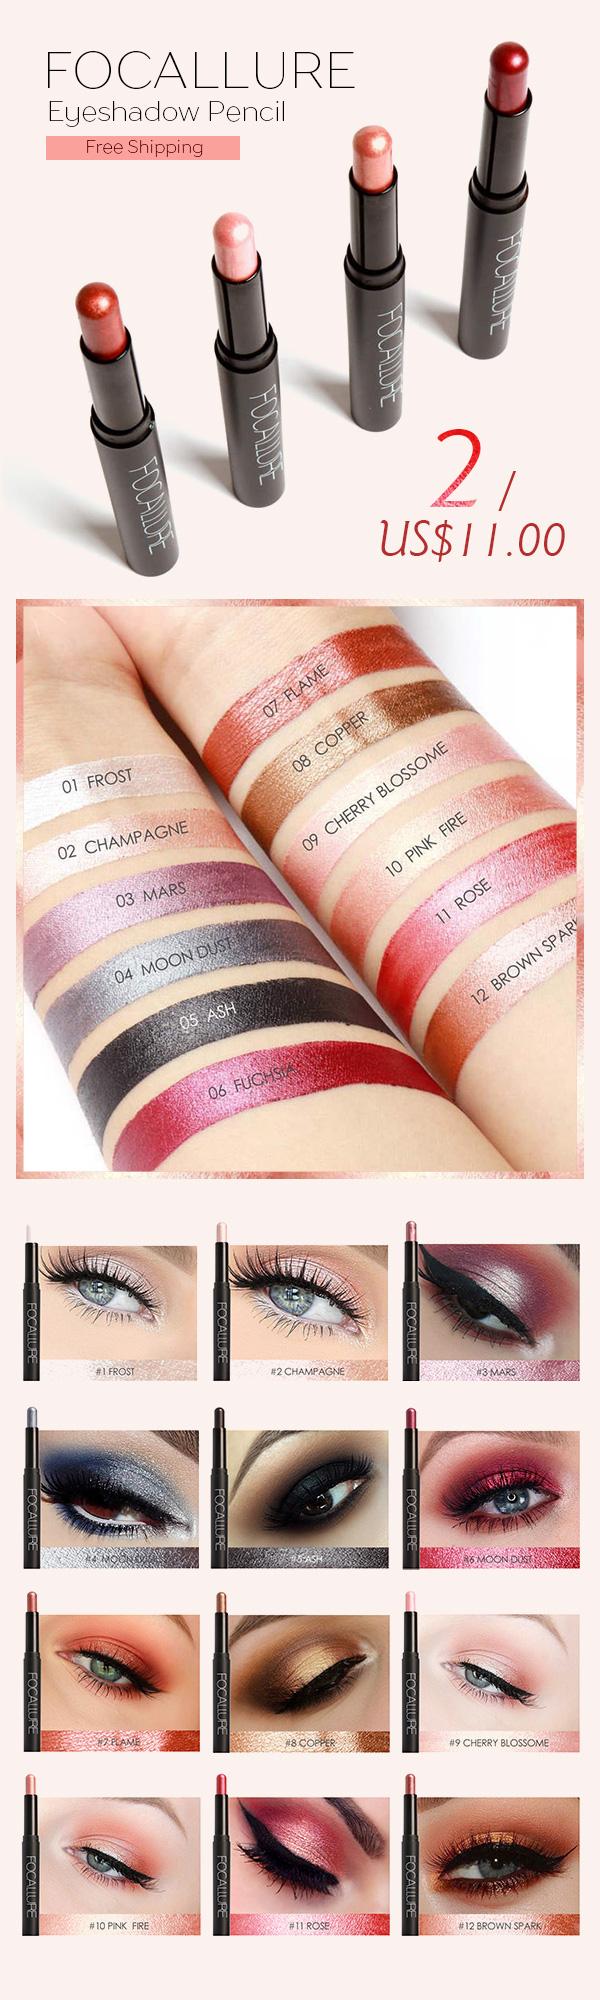 Newchic Online Shopping 48off Focallure Eyeshadow Pencil